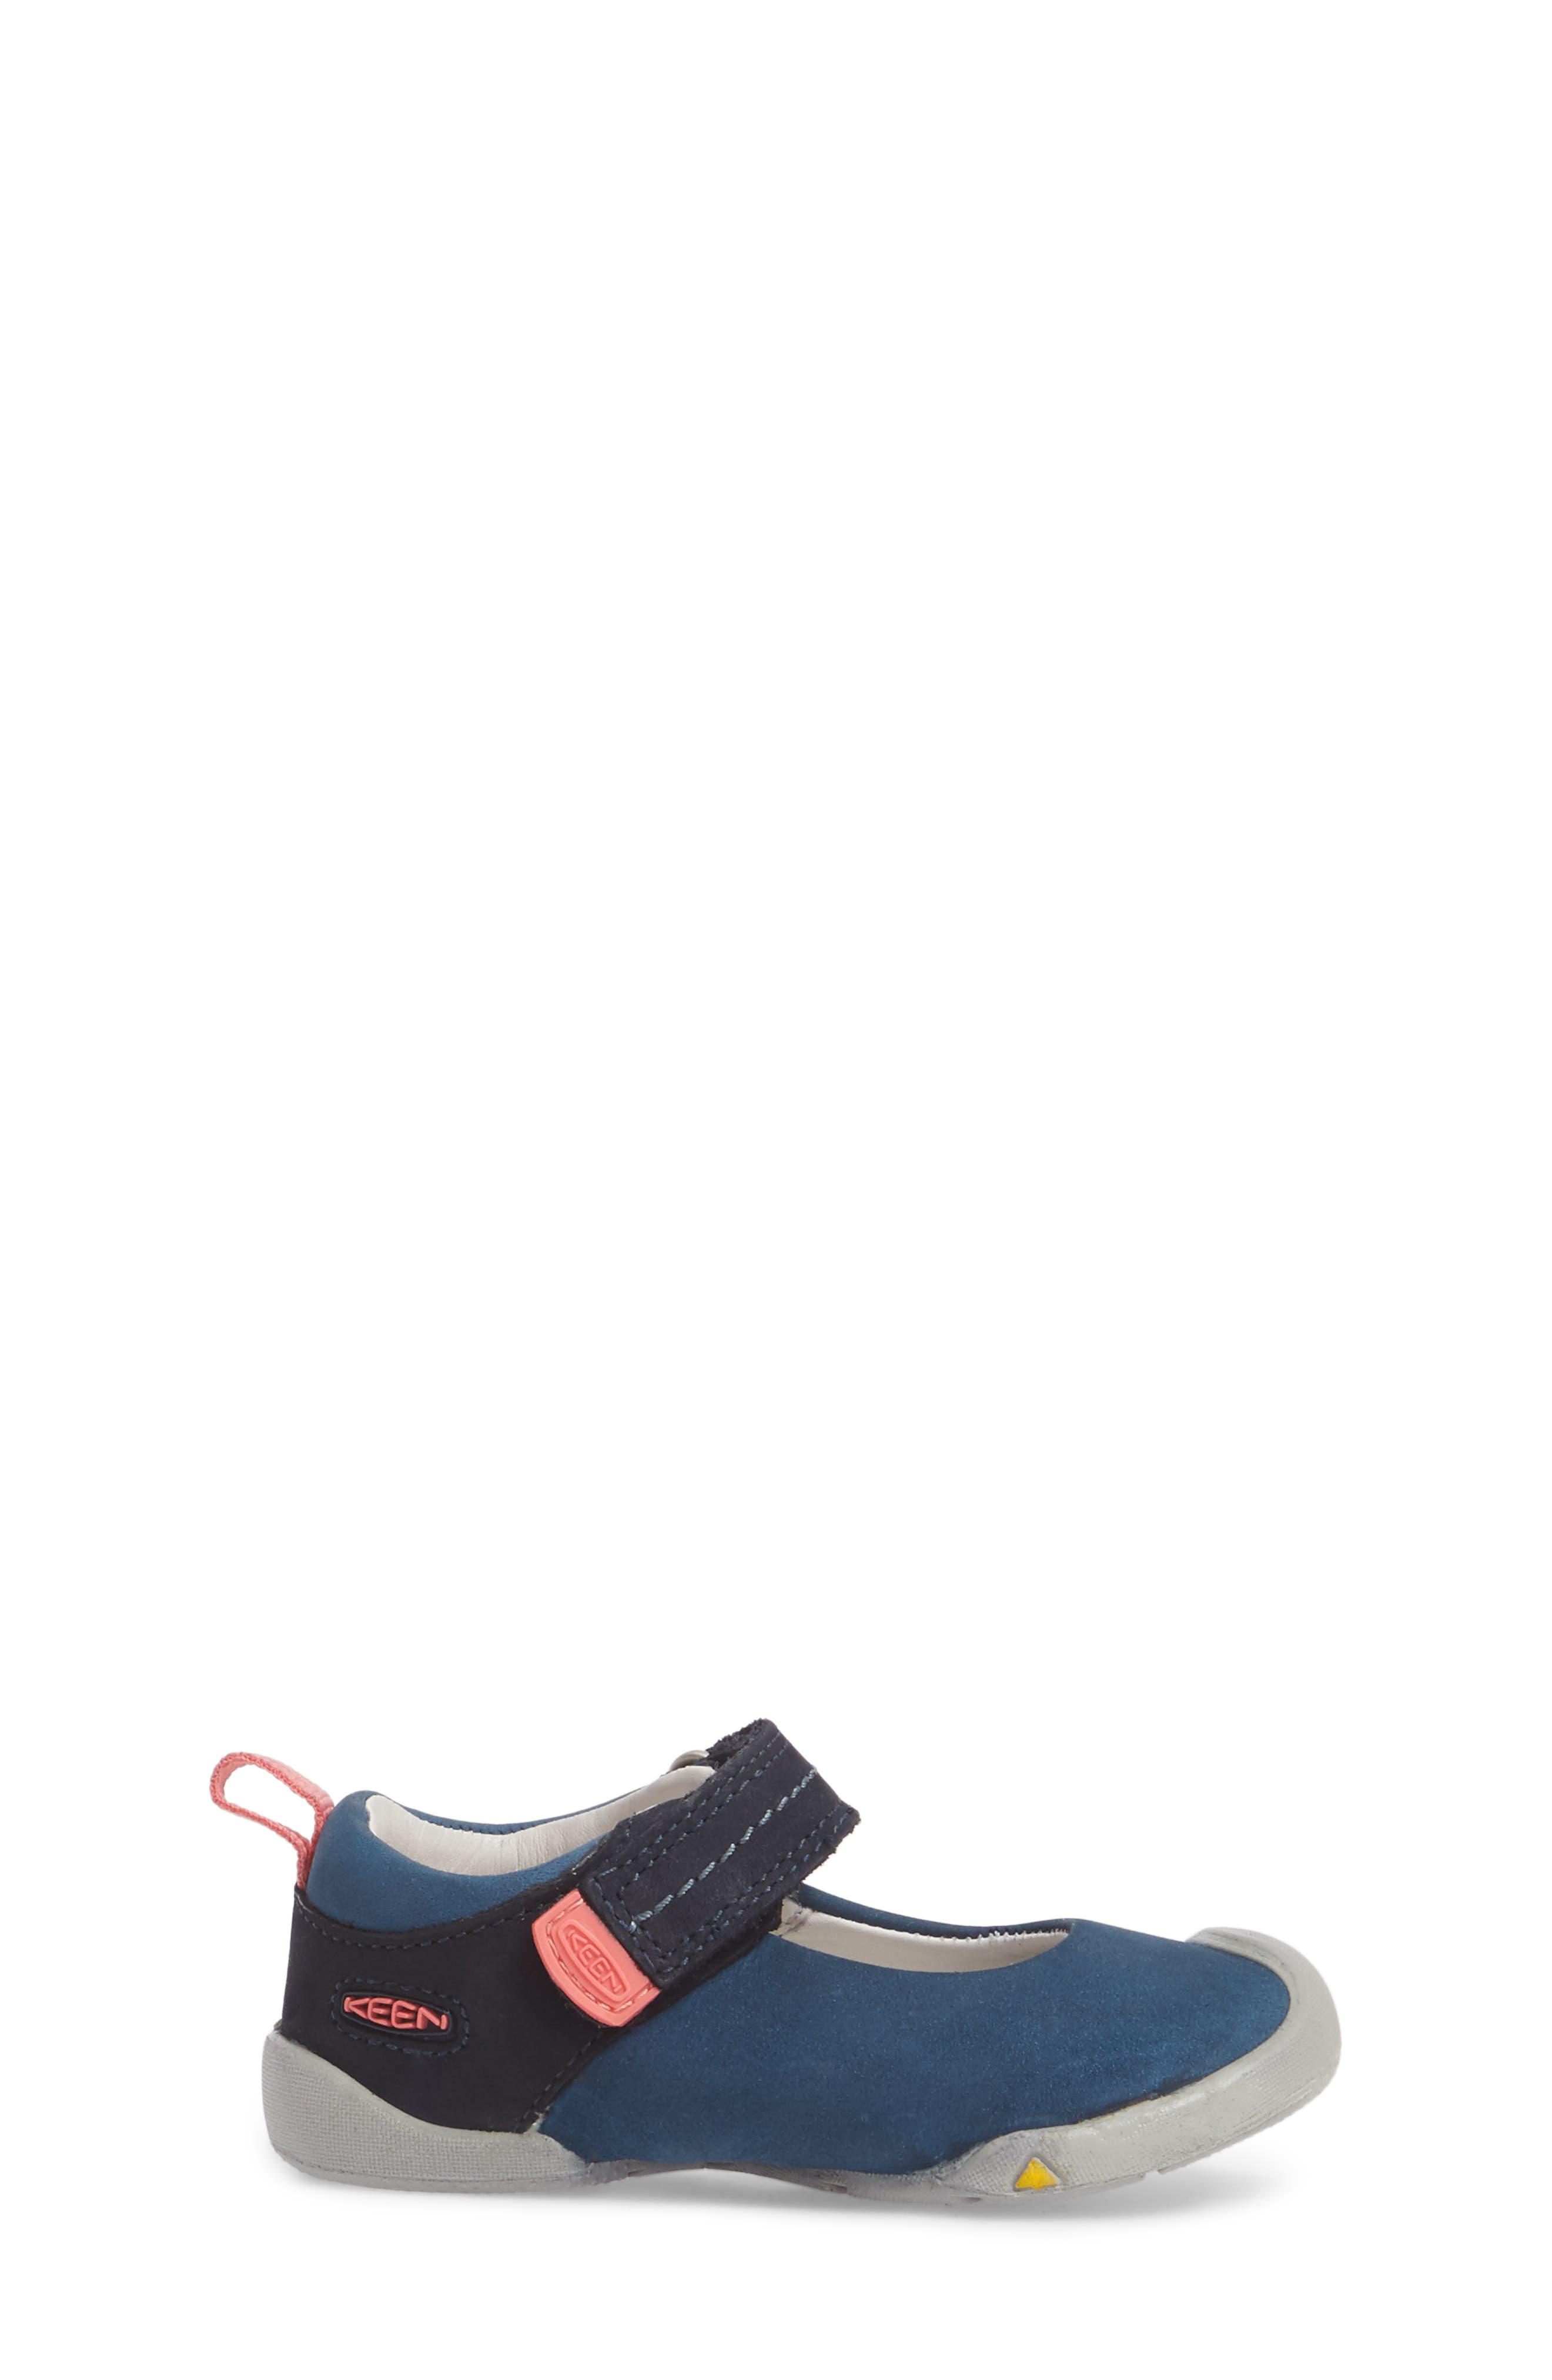 Pep Mary Jane-T Sneaker,                             Alternate thumbnail 3, color,                             Dress Blues/ Sugar Coral